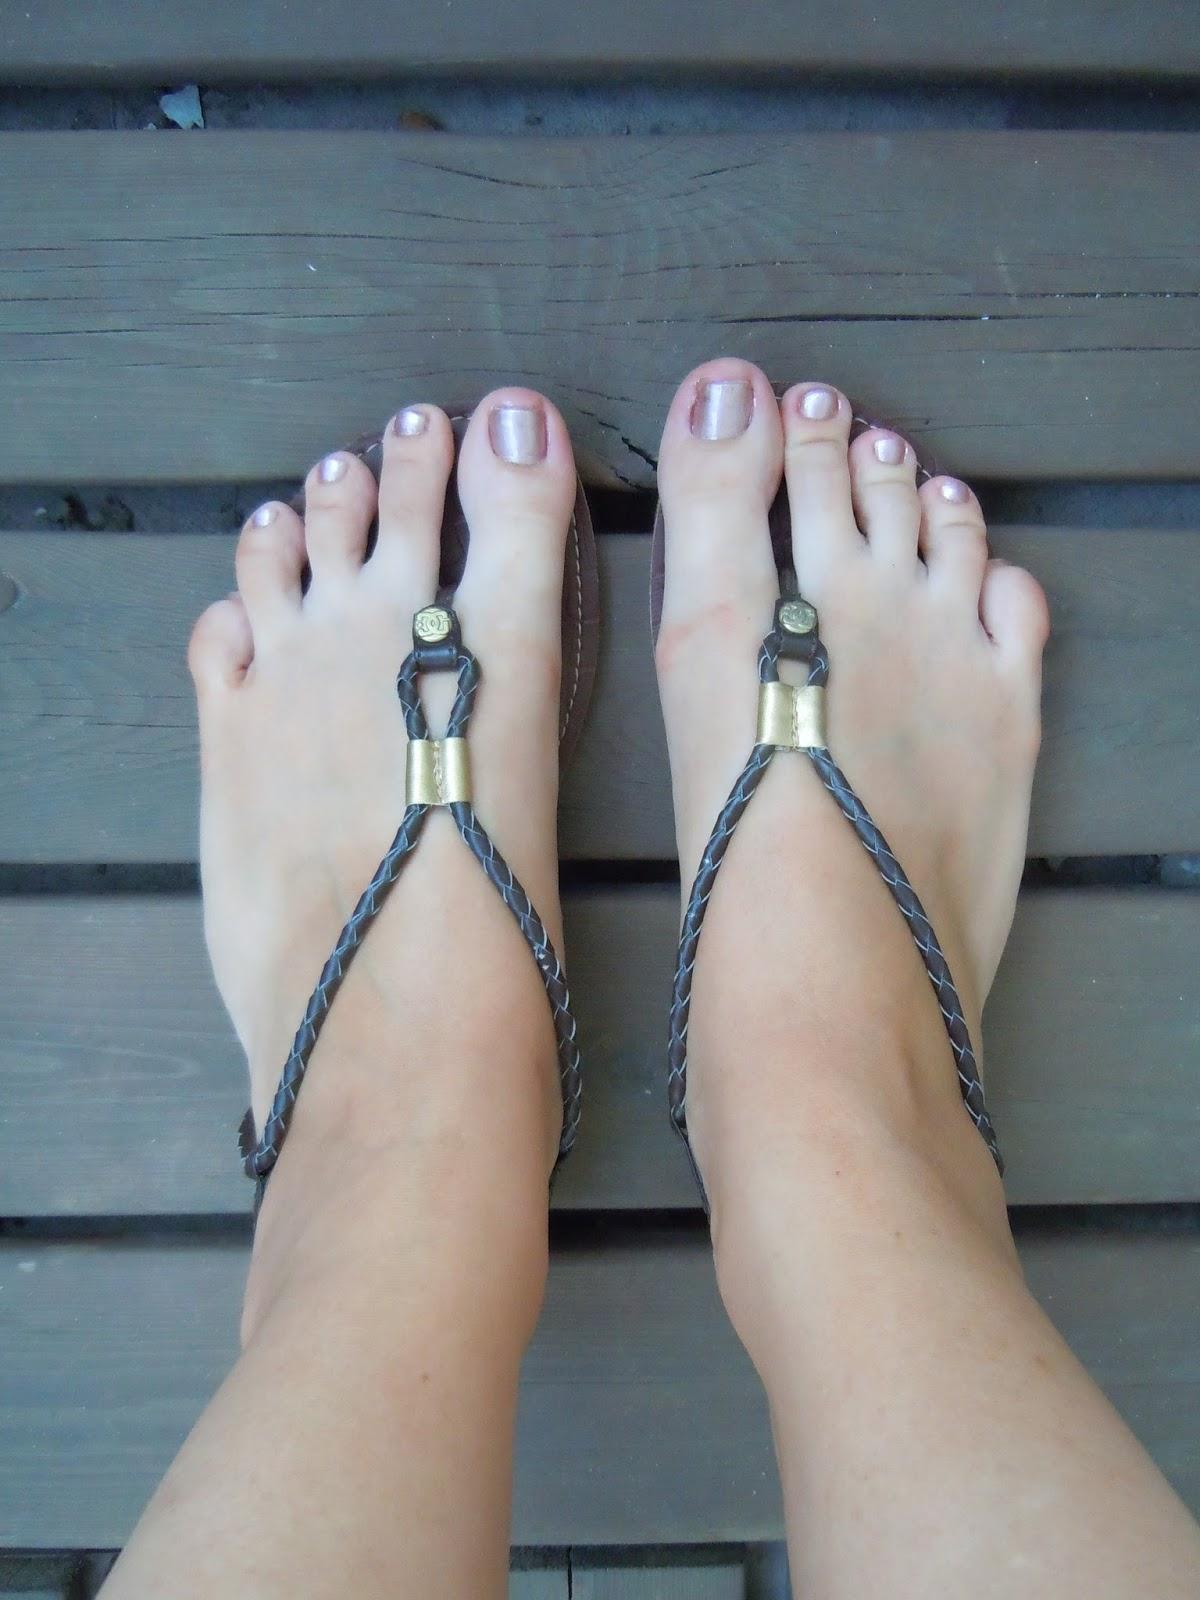 finnish legs and feet finnkino mobiili